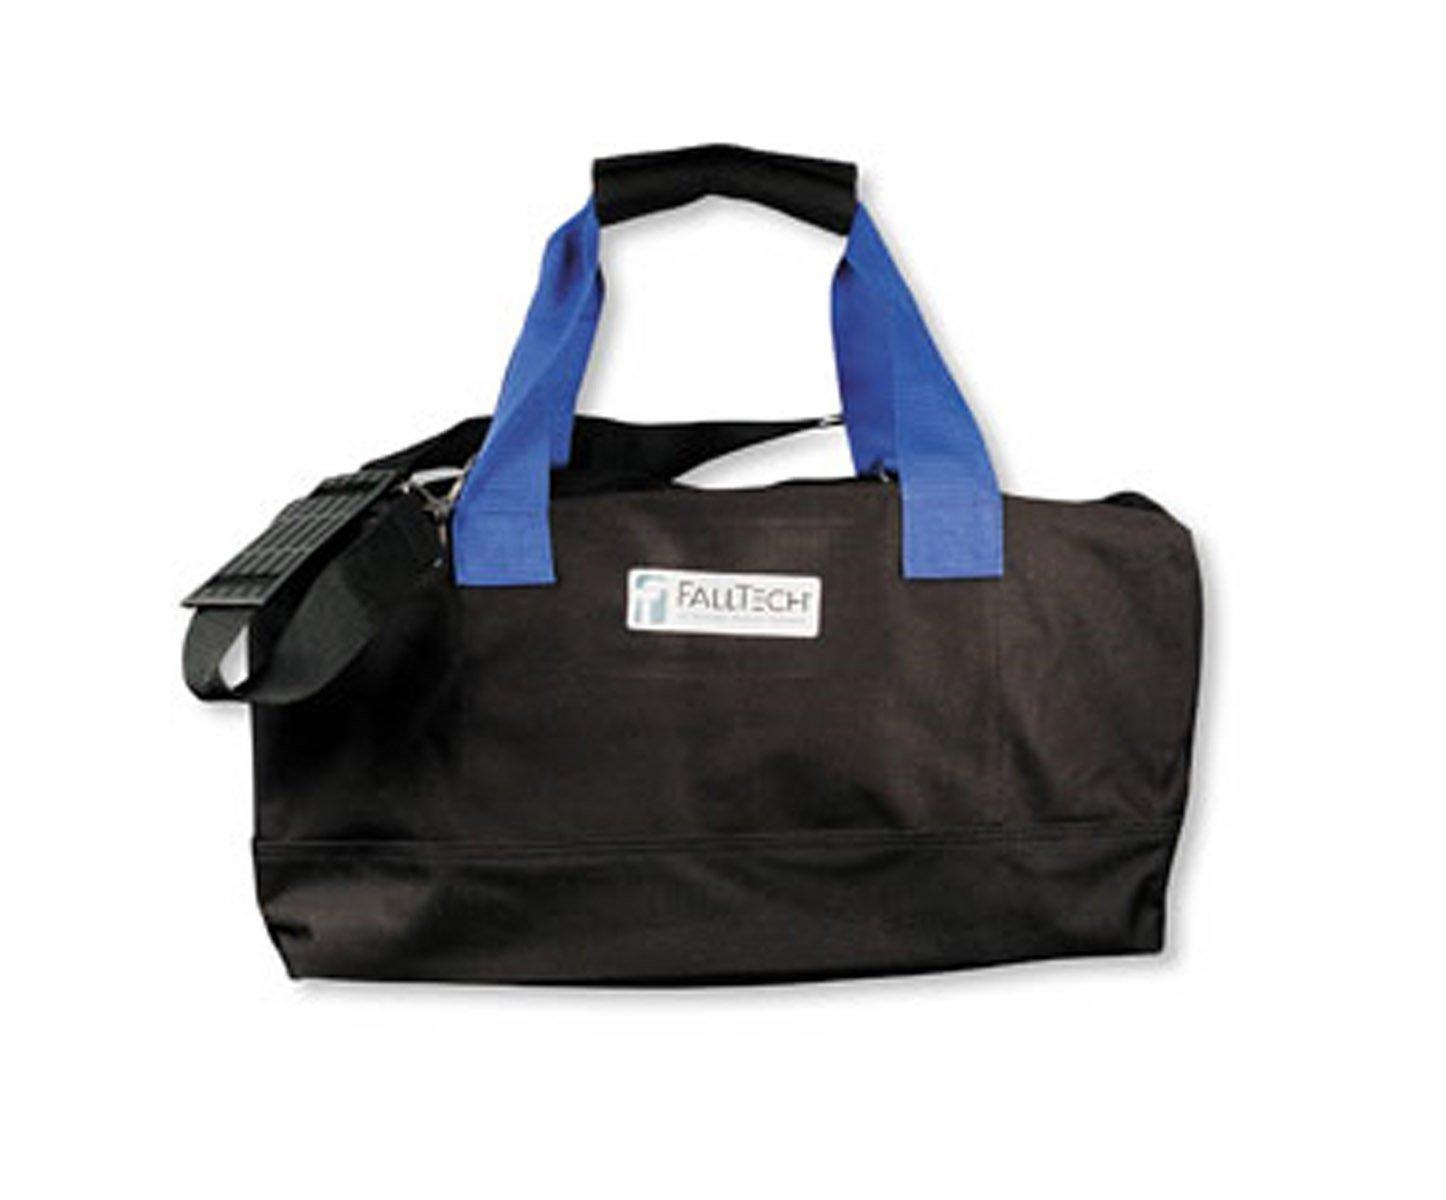 FallTech 5007LP Gear Bag with Strap 18-Inch